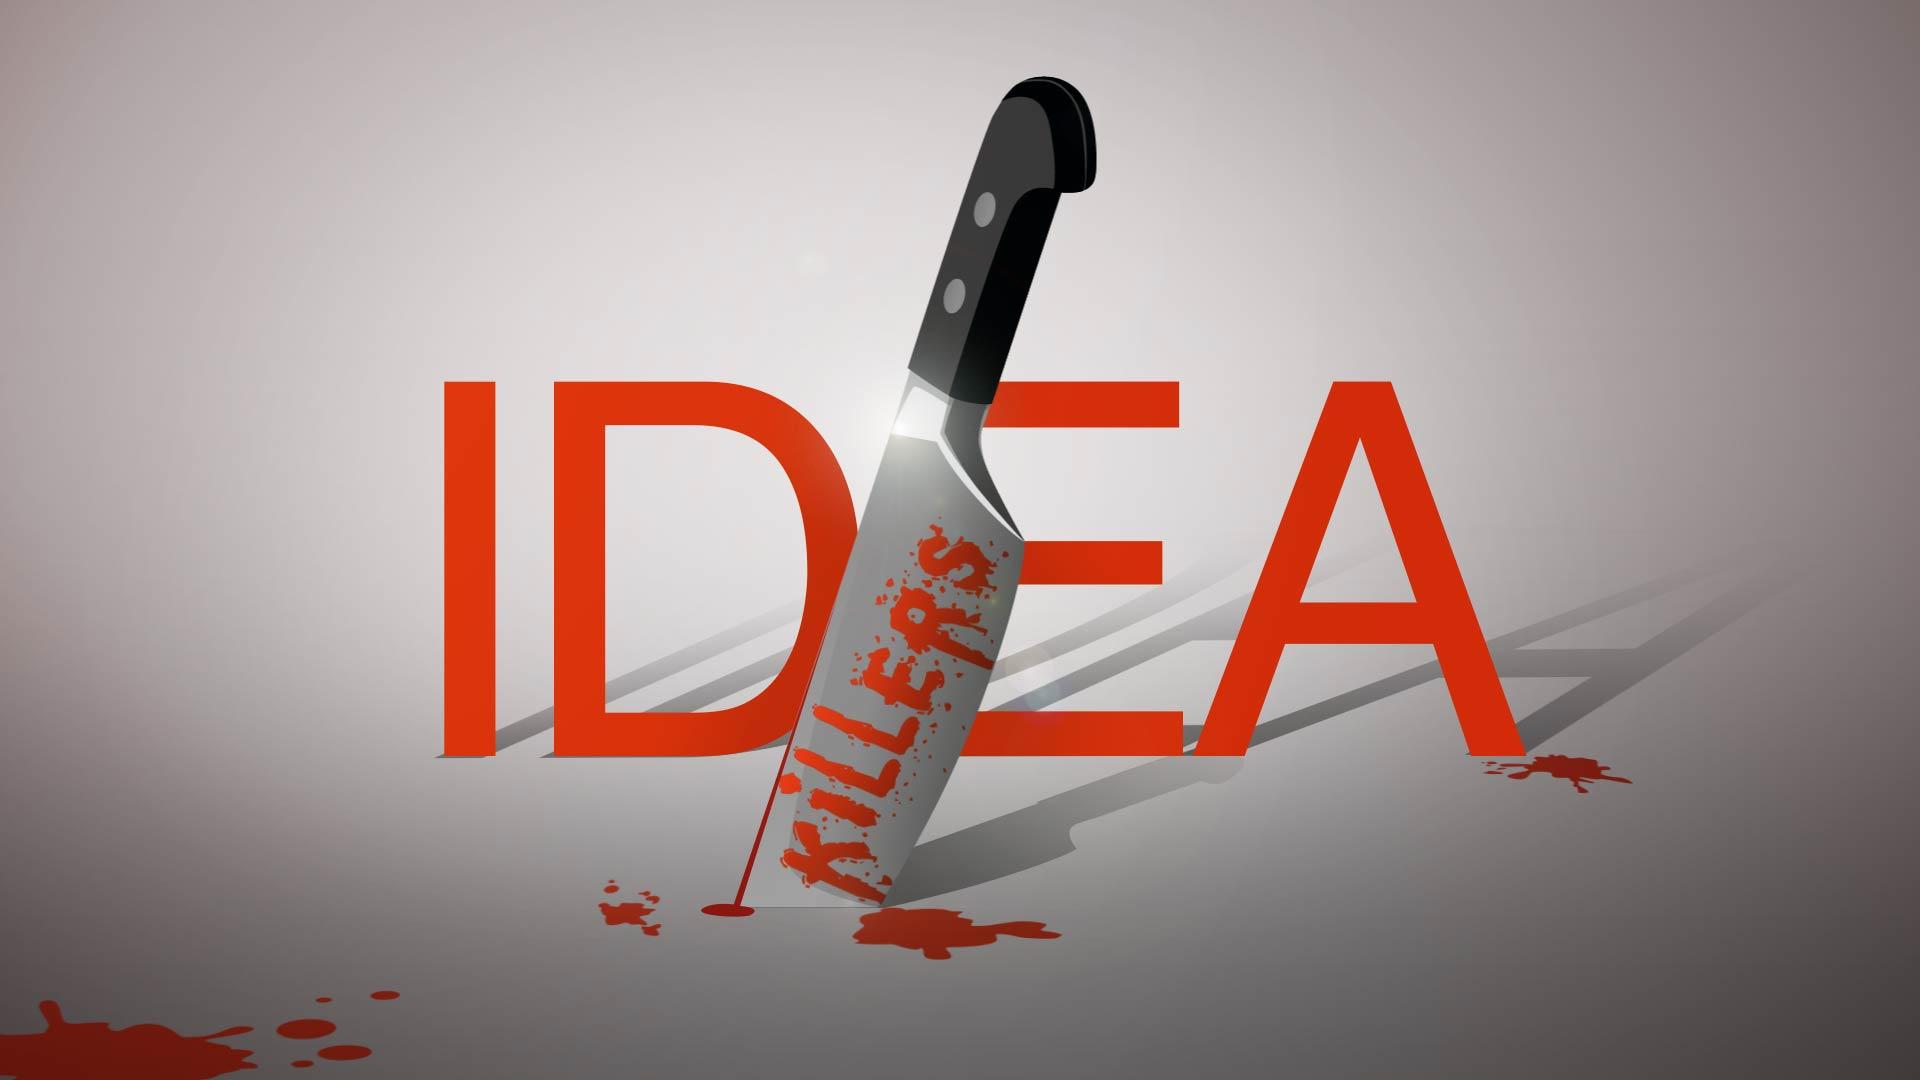 Ideation - Idea Killers